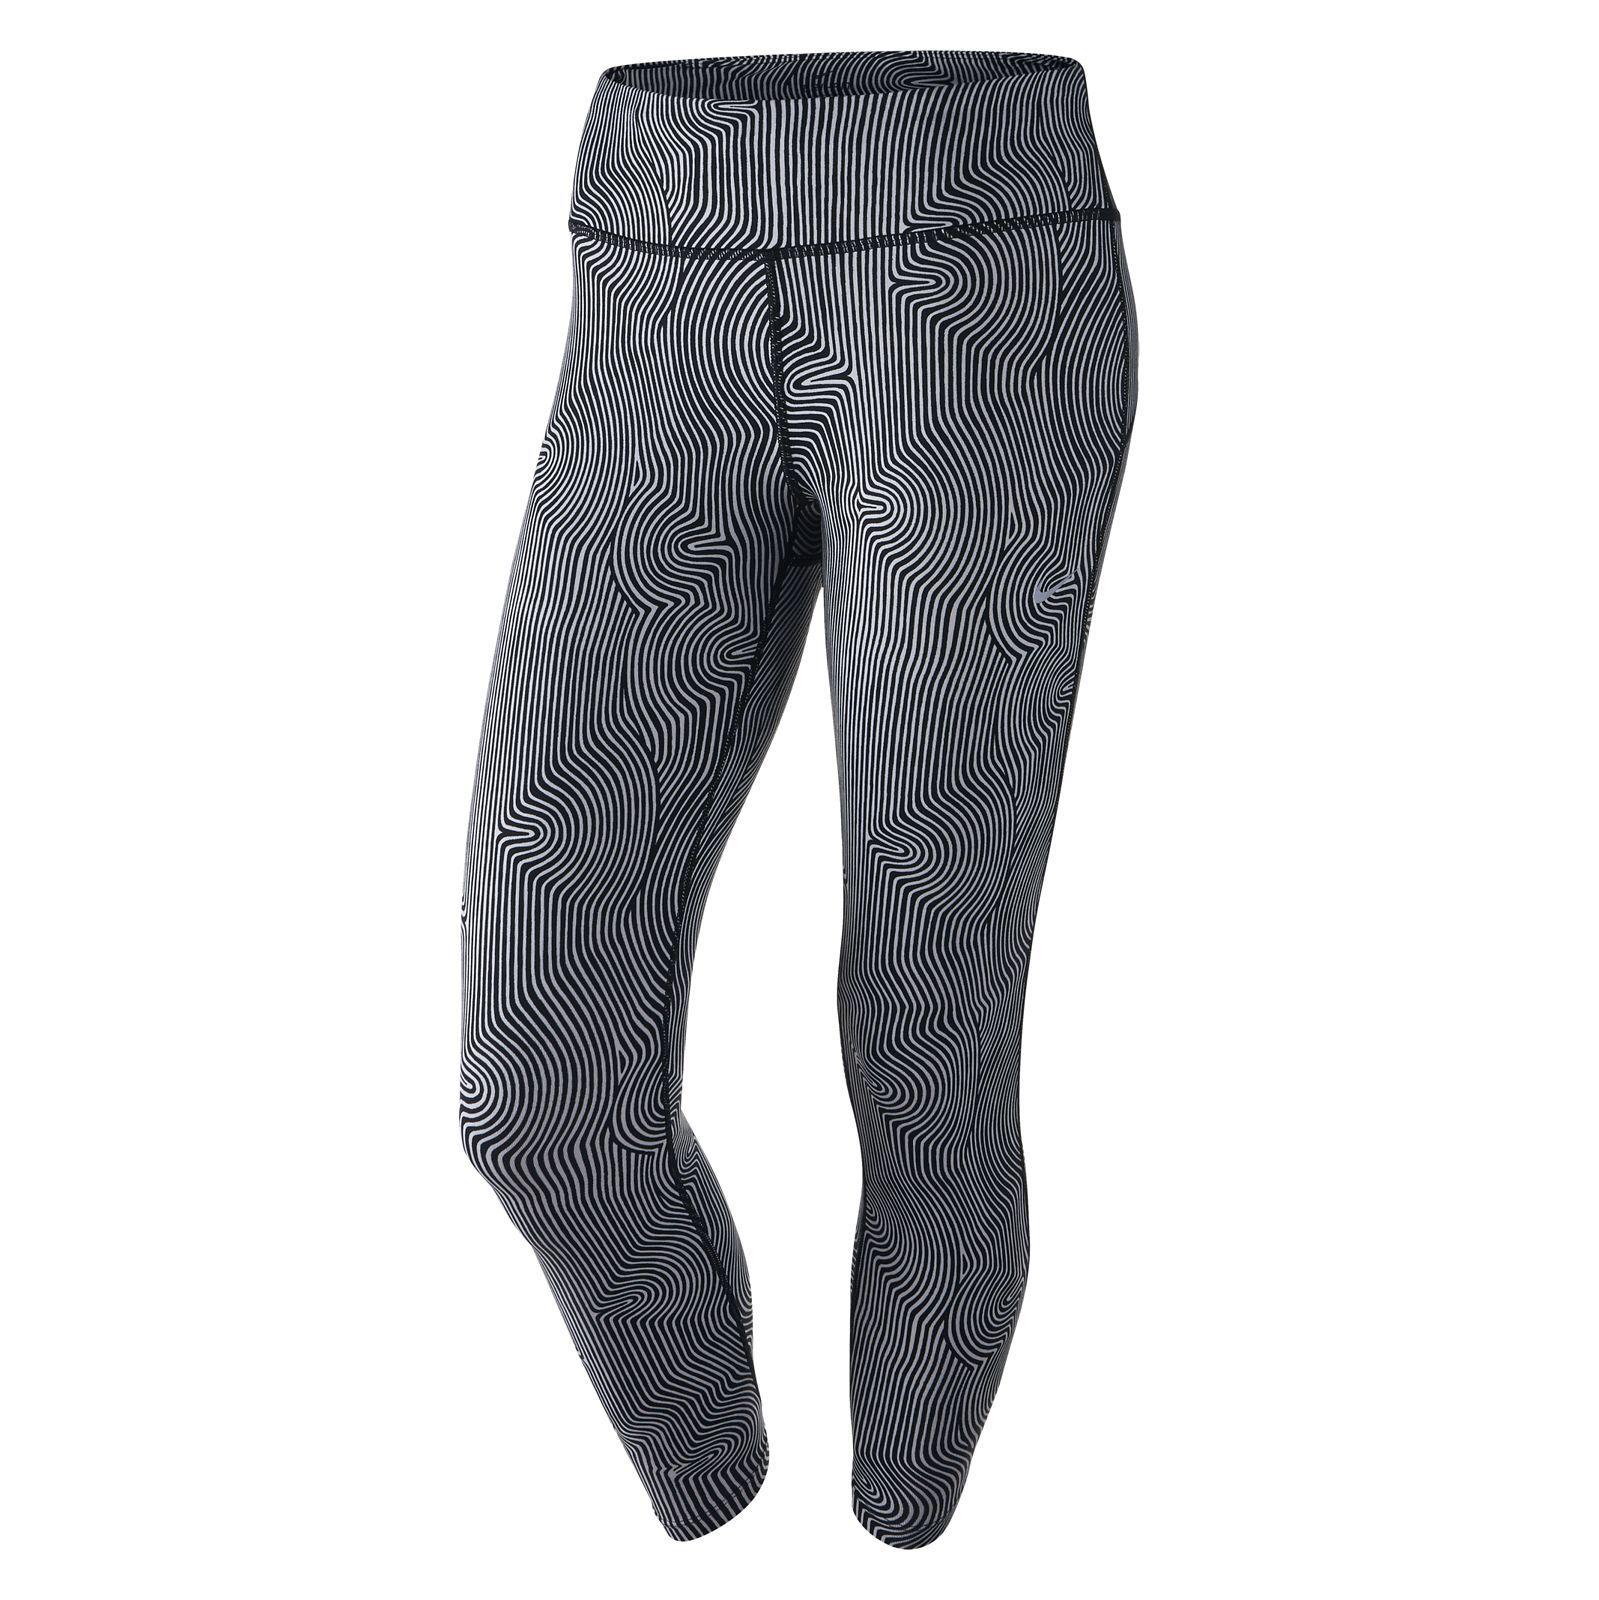 Spodnie Nike Epic Run Zen Print W 719811